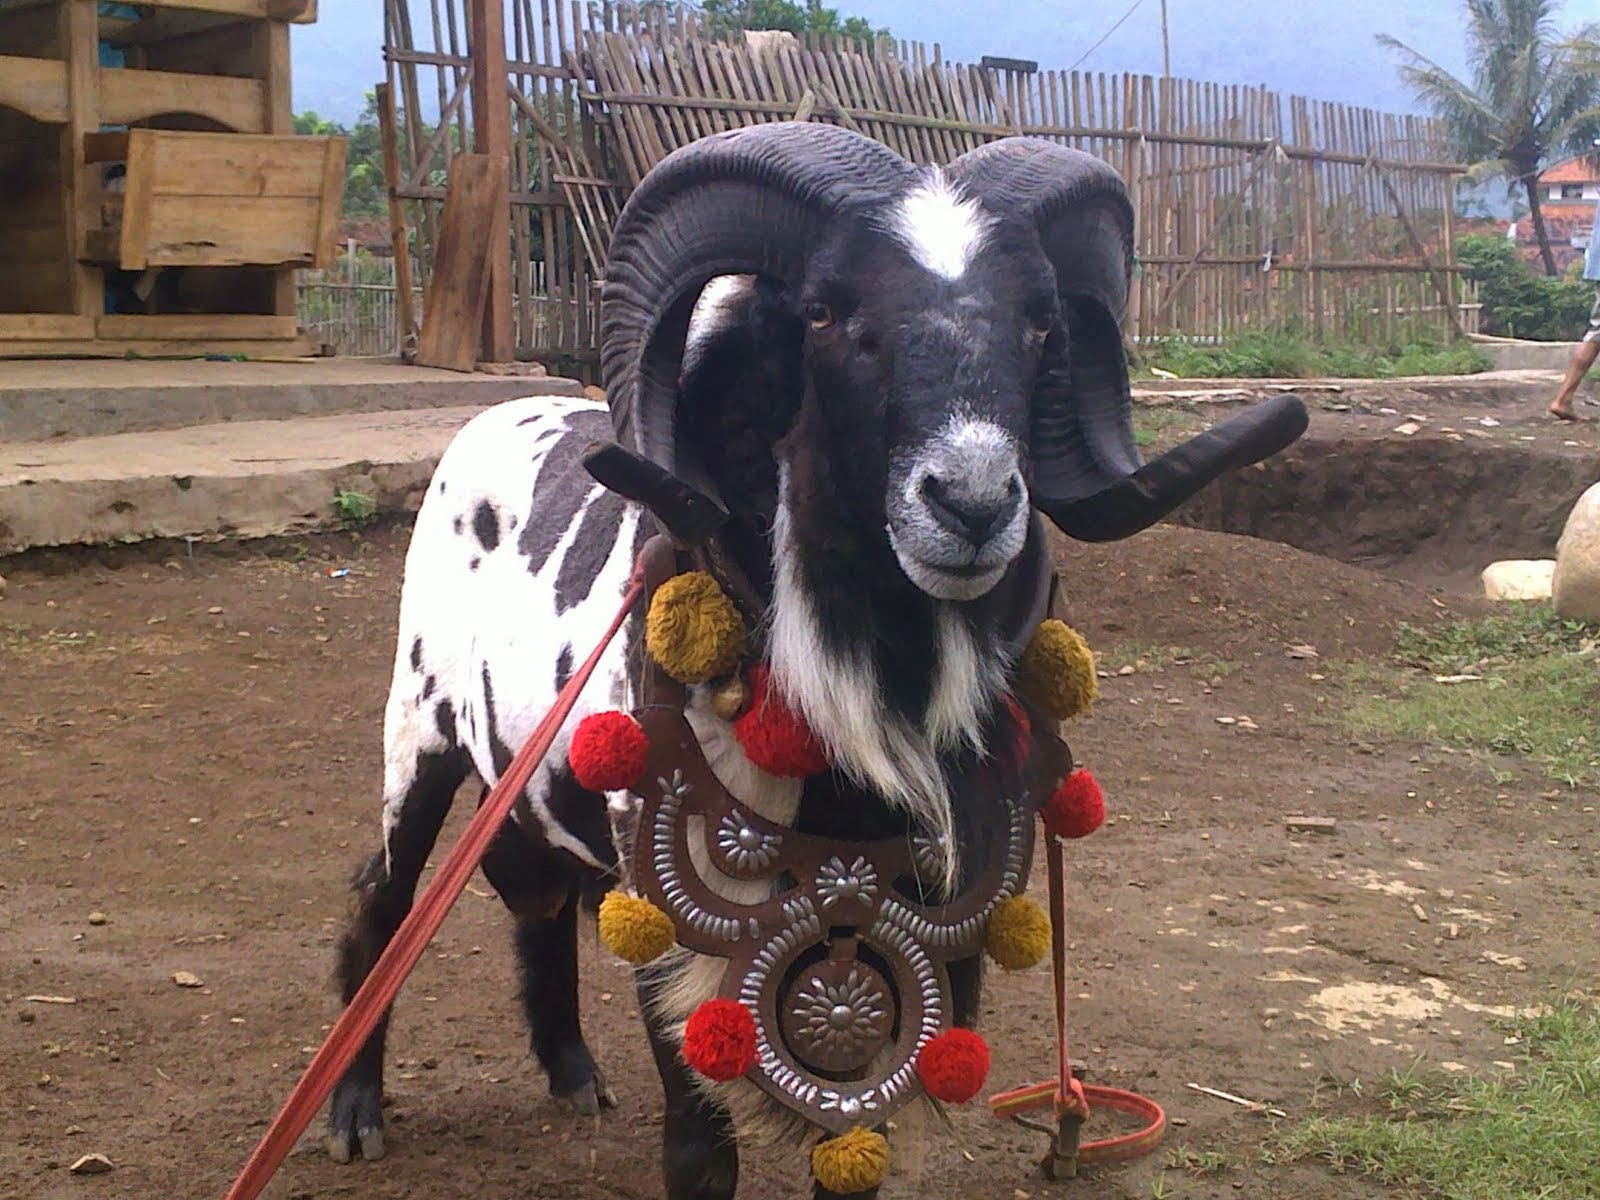 Kesenian Adu Ketangkasan Domba — Steemit throughout Gambar Domba Diadu